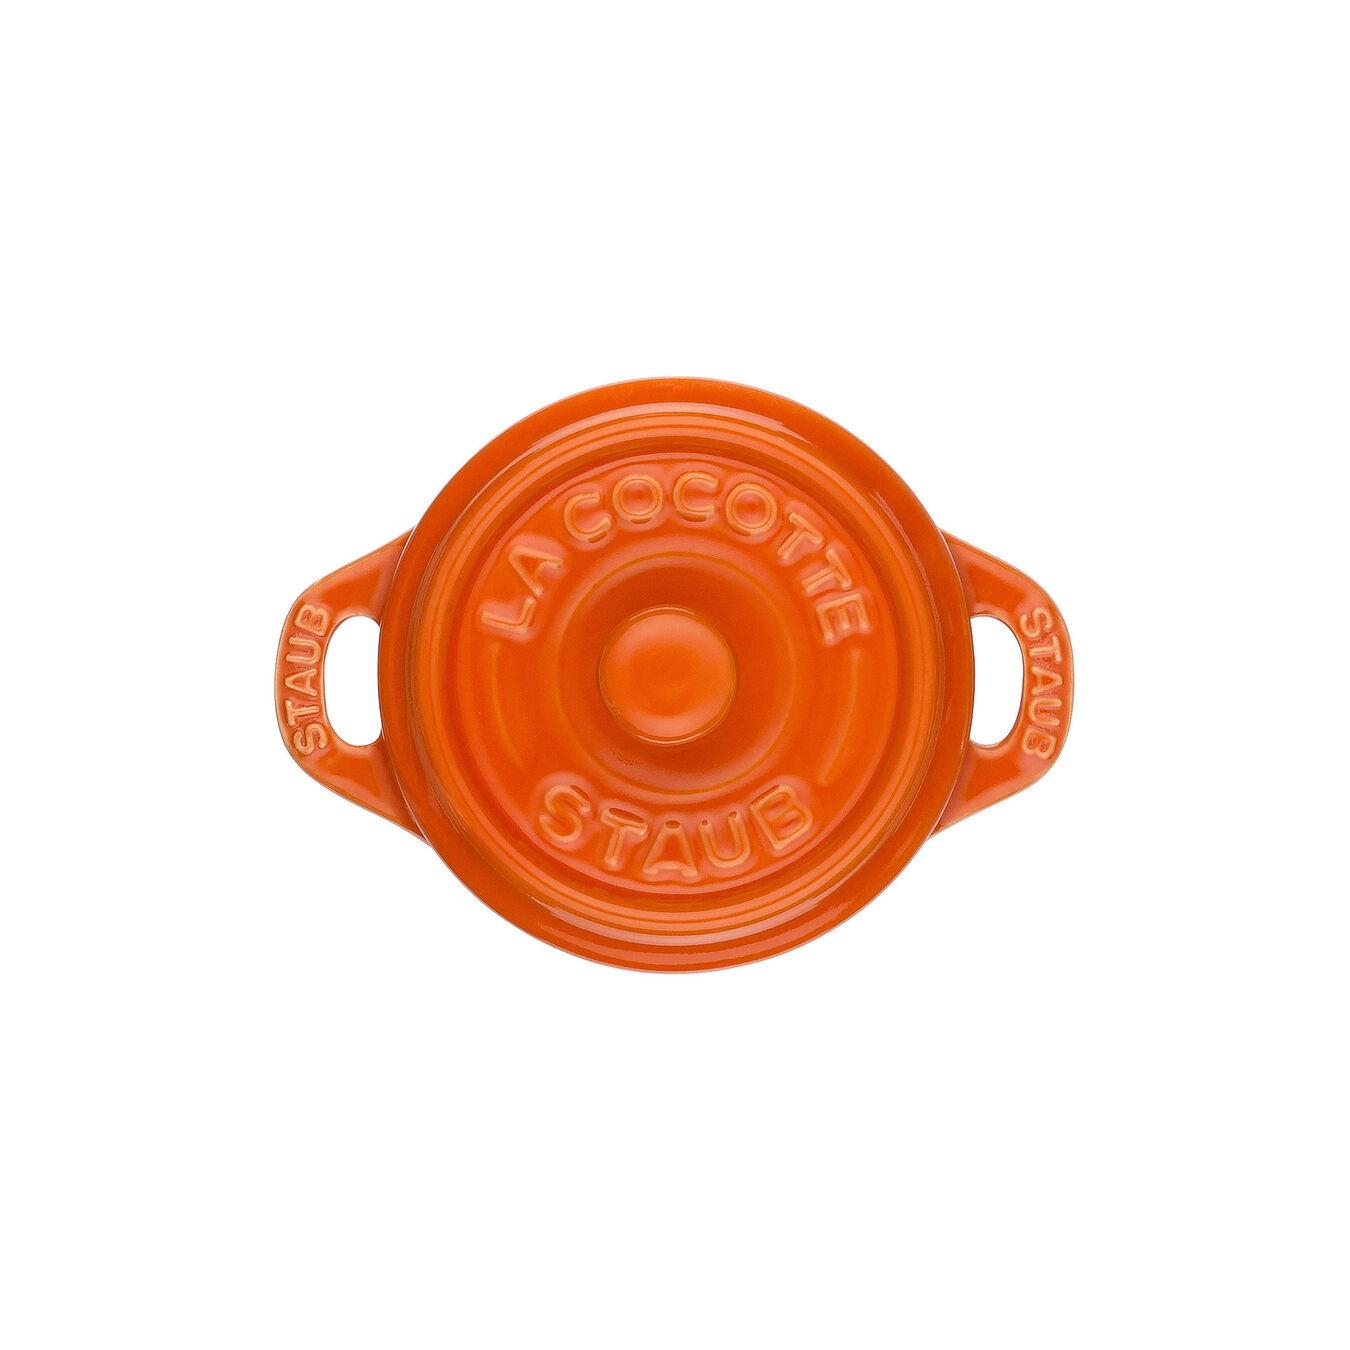 Mini Cocotte 10 cm, Rund, Orange, Stentøj,,large 3